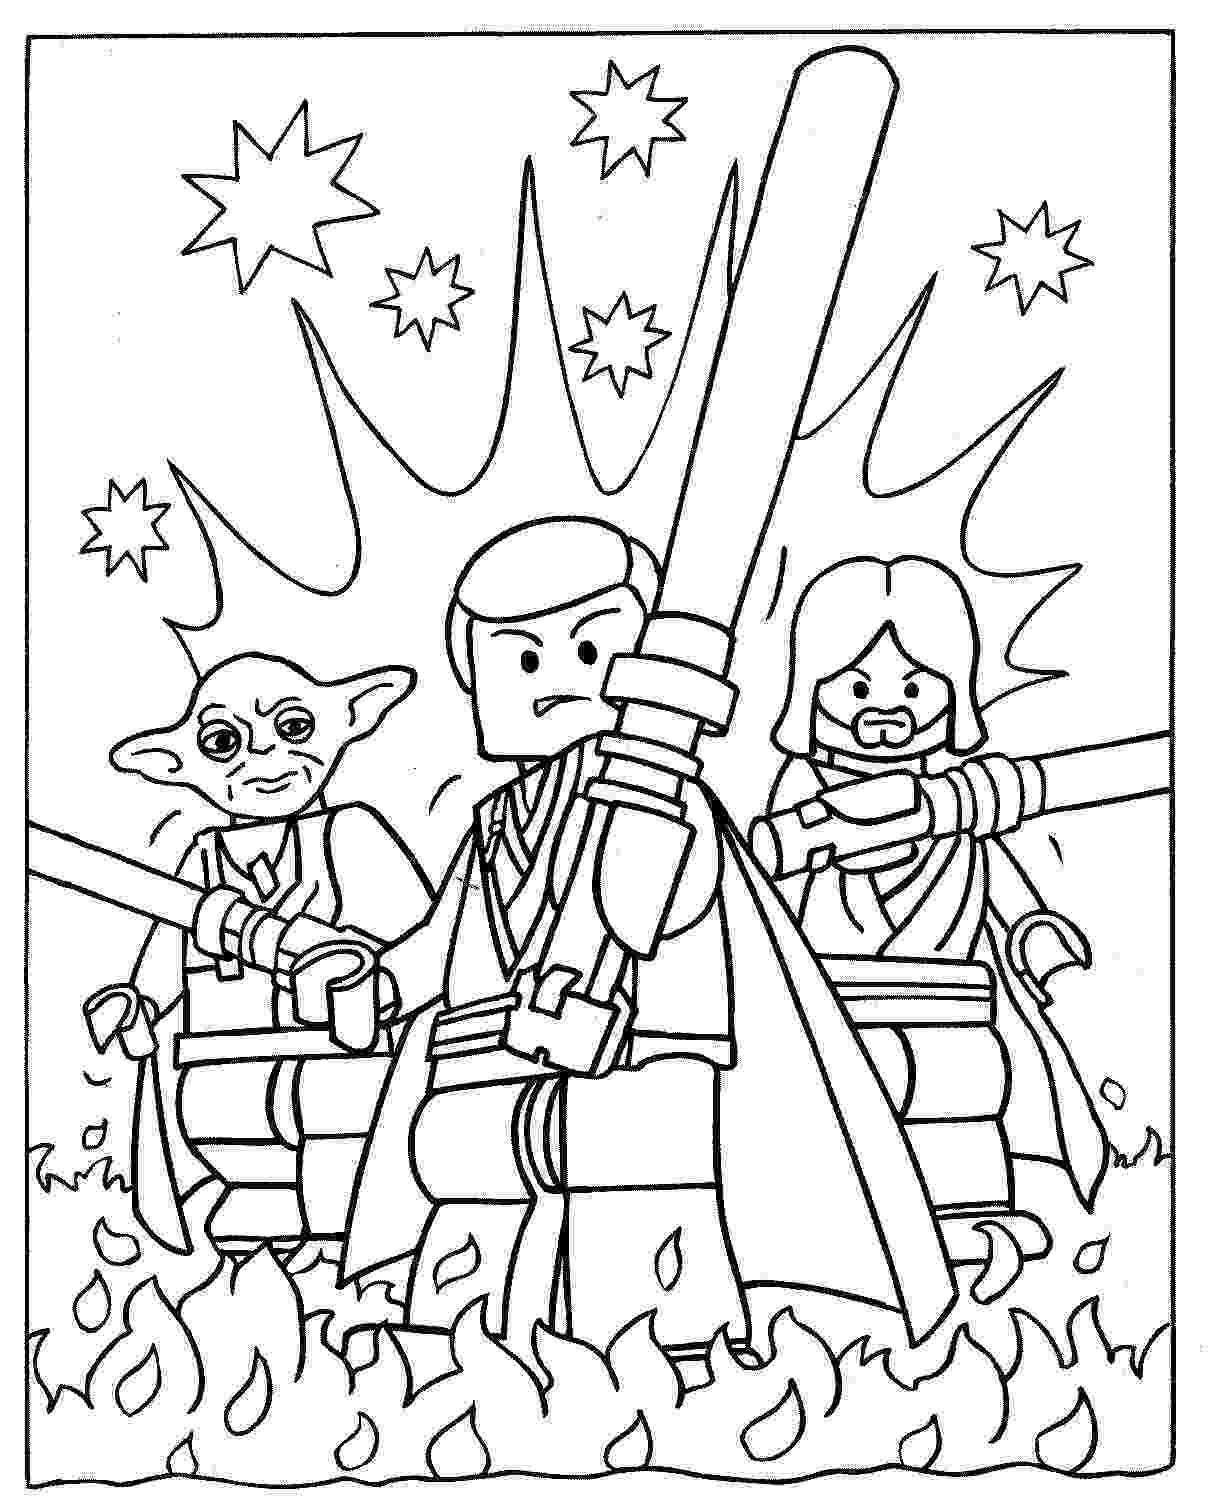 star wars coloring book pdf star wars coloring pages pdf at getcoloringscom free pdf book wars star coloring